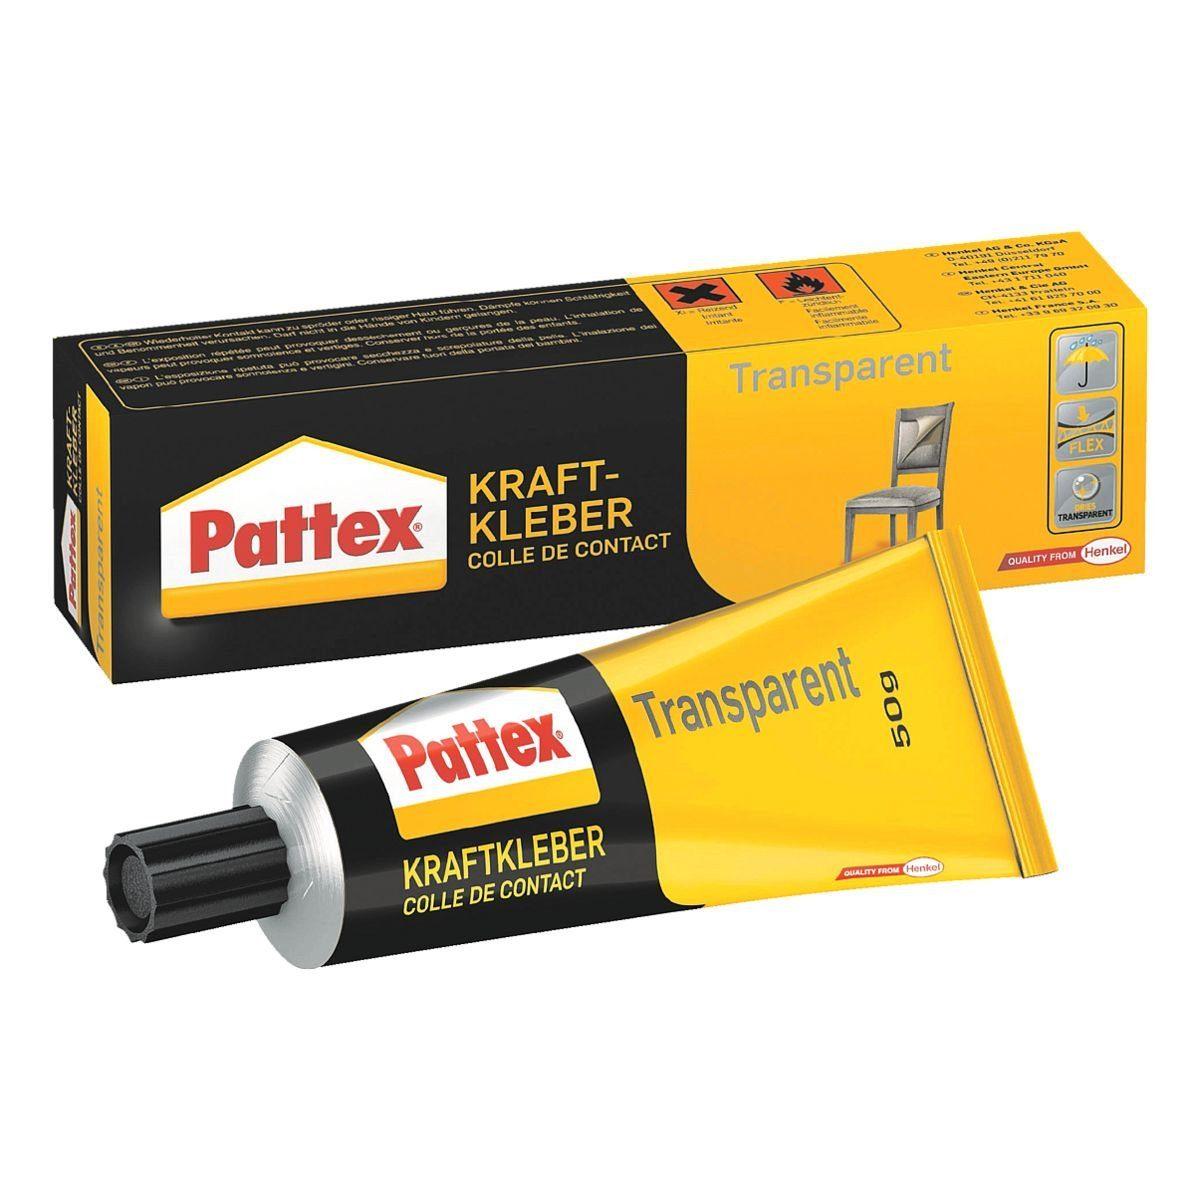 Pattex Kraftkleber »Transparent«